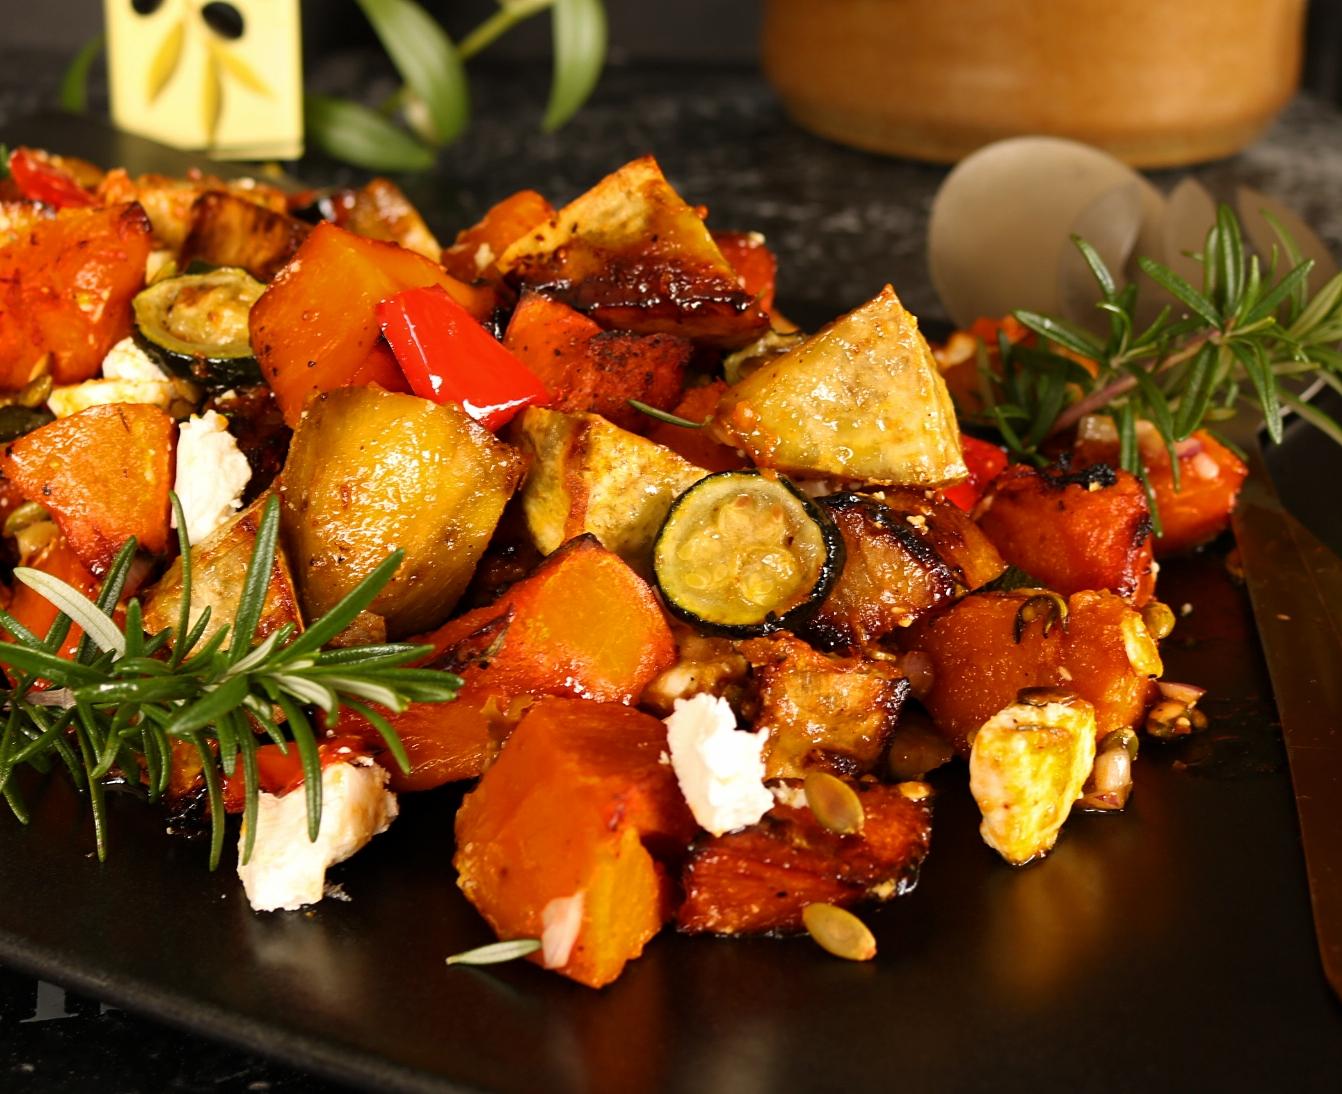 Roast Vegetable Salad With Maple Dressing |